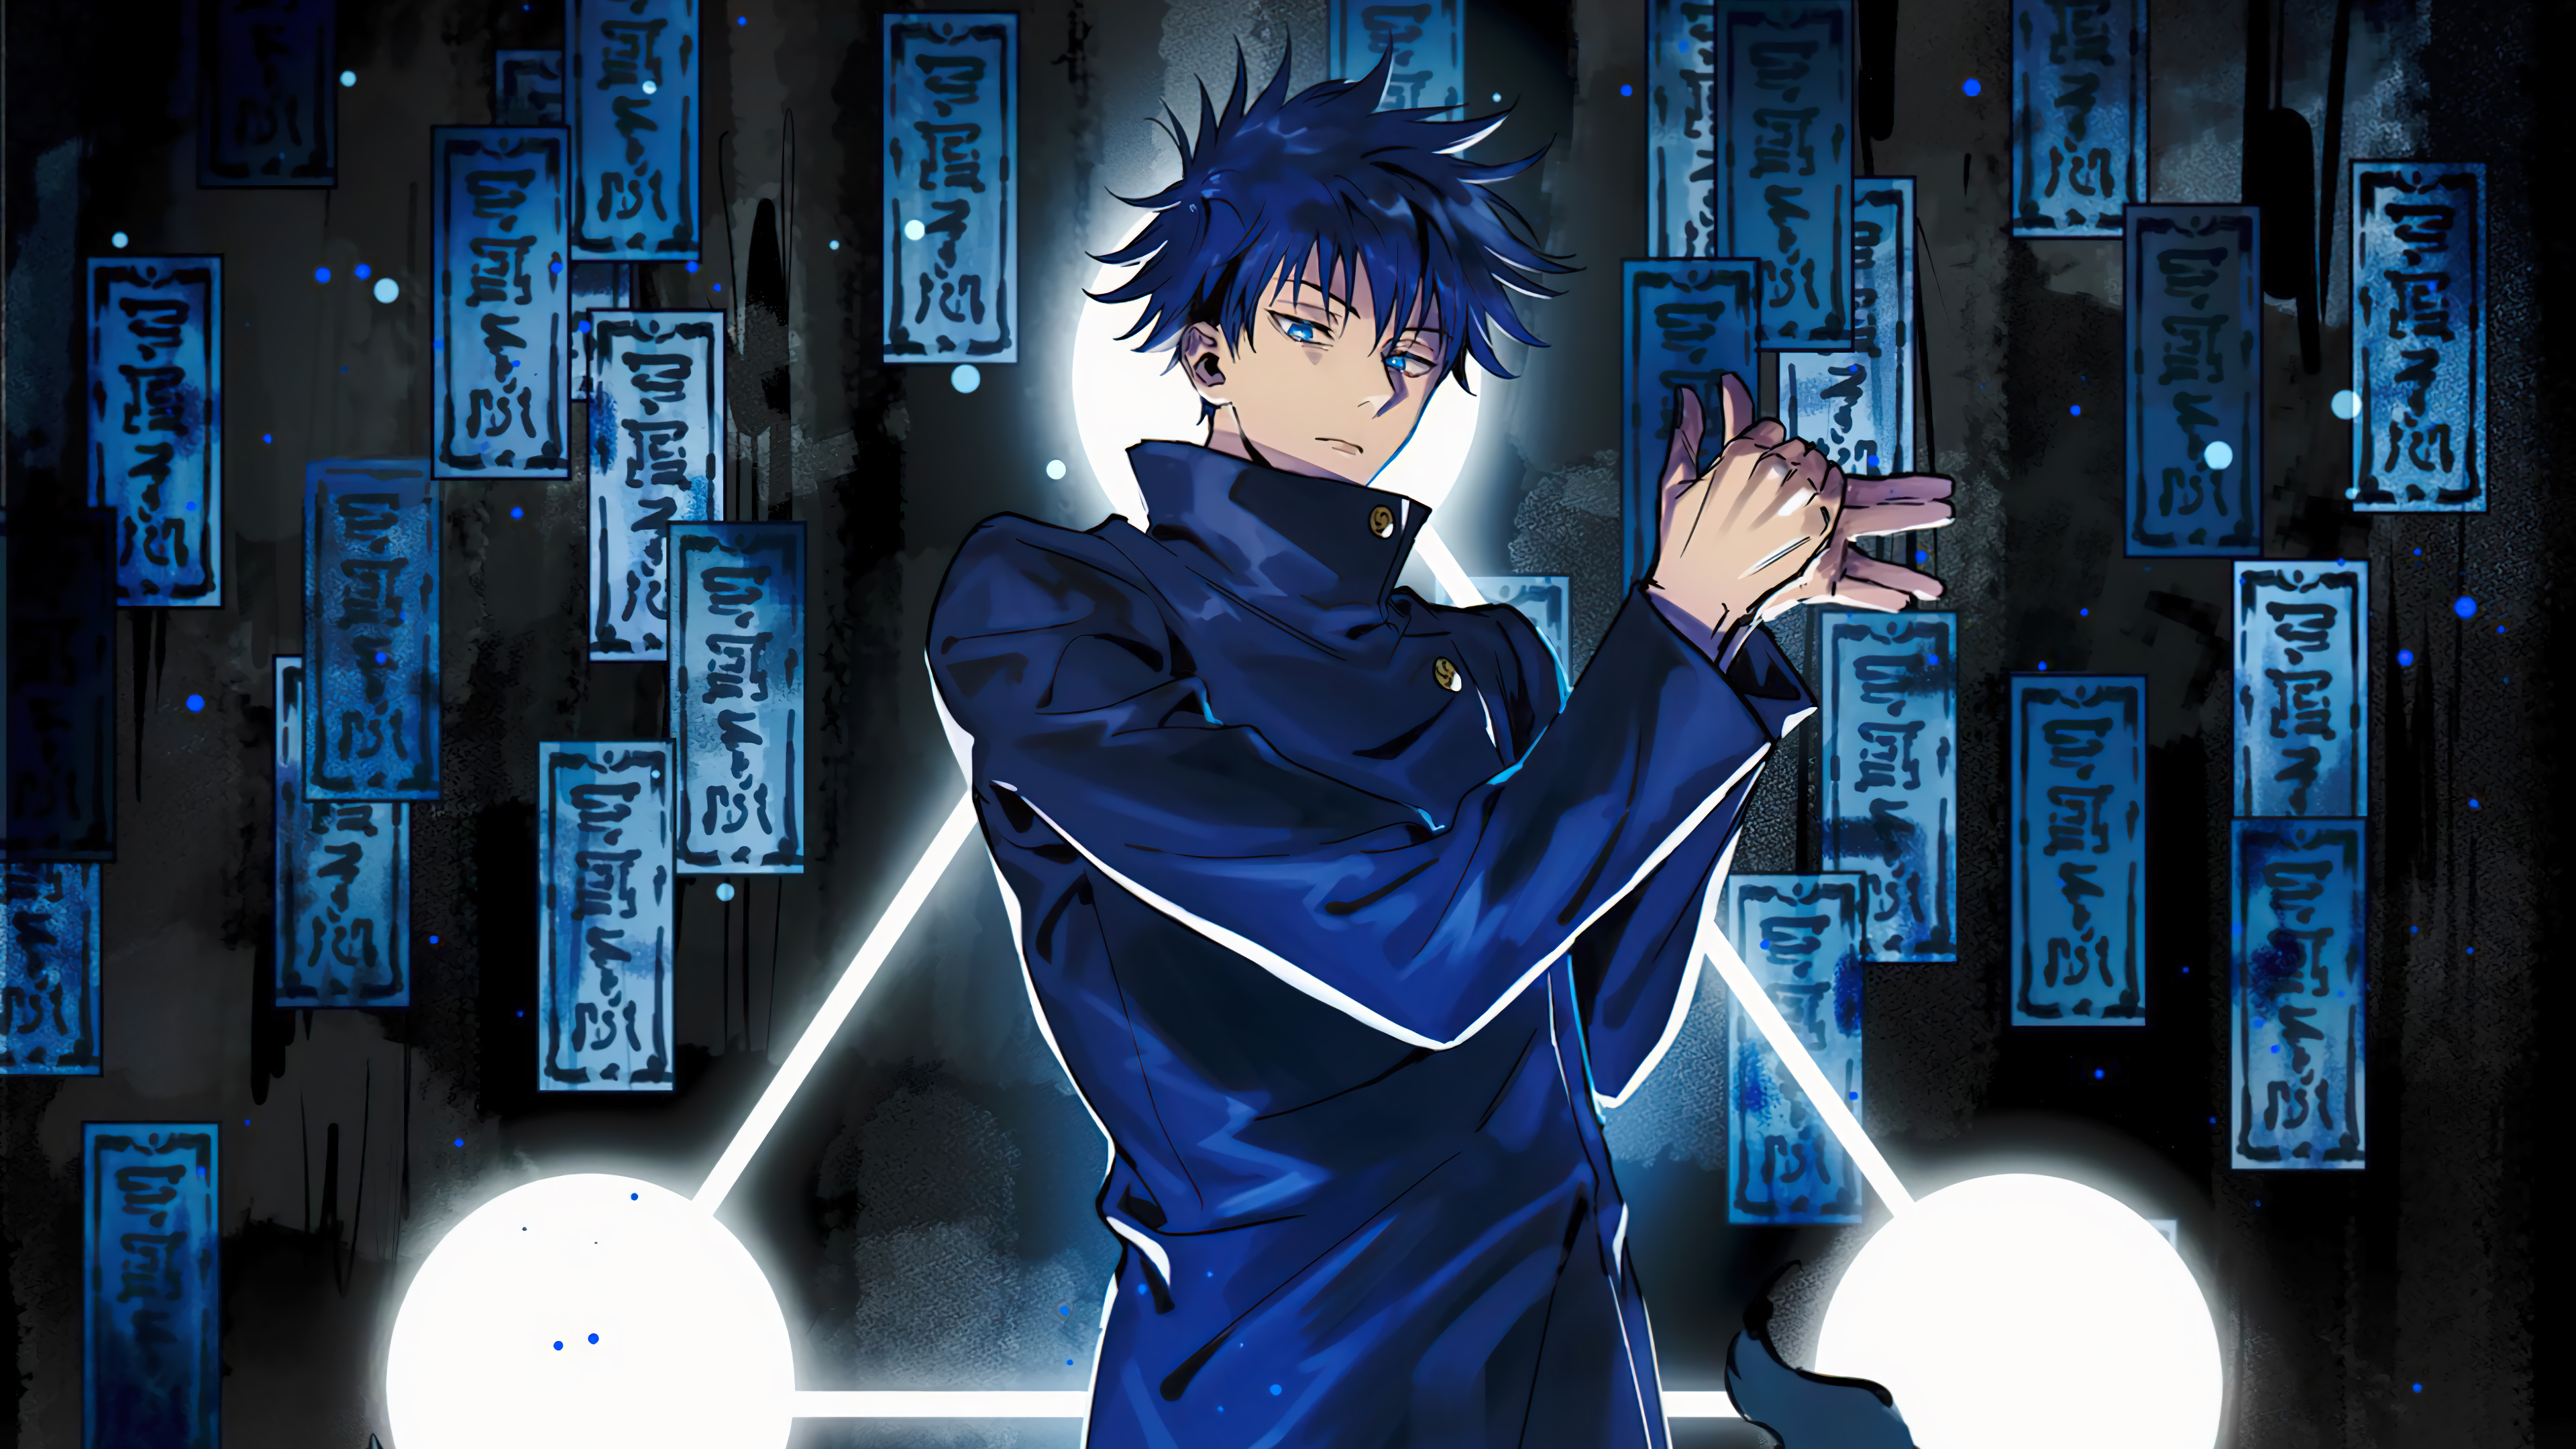 Fondos de pantalla Anime Megumi Fushiguro de Jujutsu Kaisen